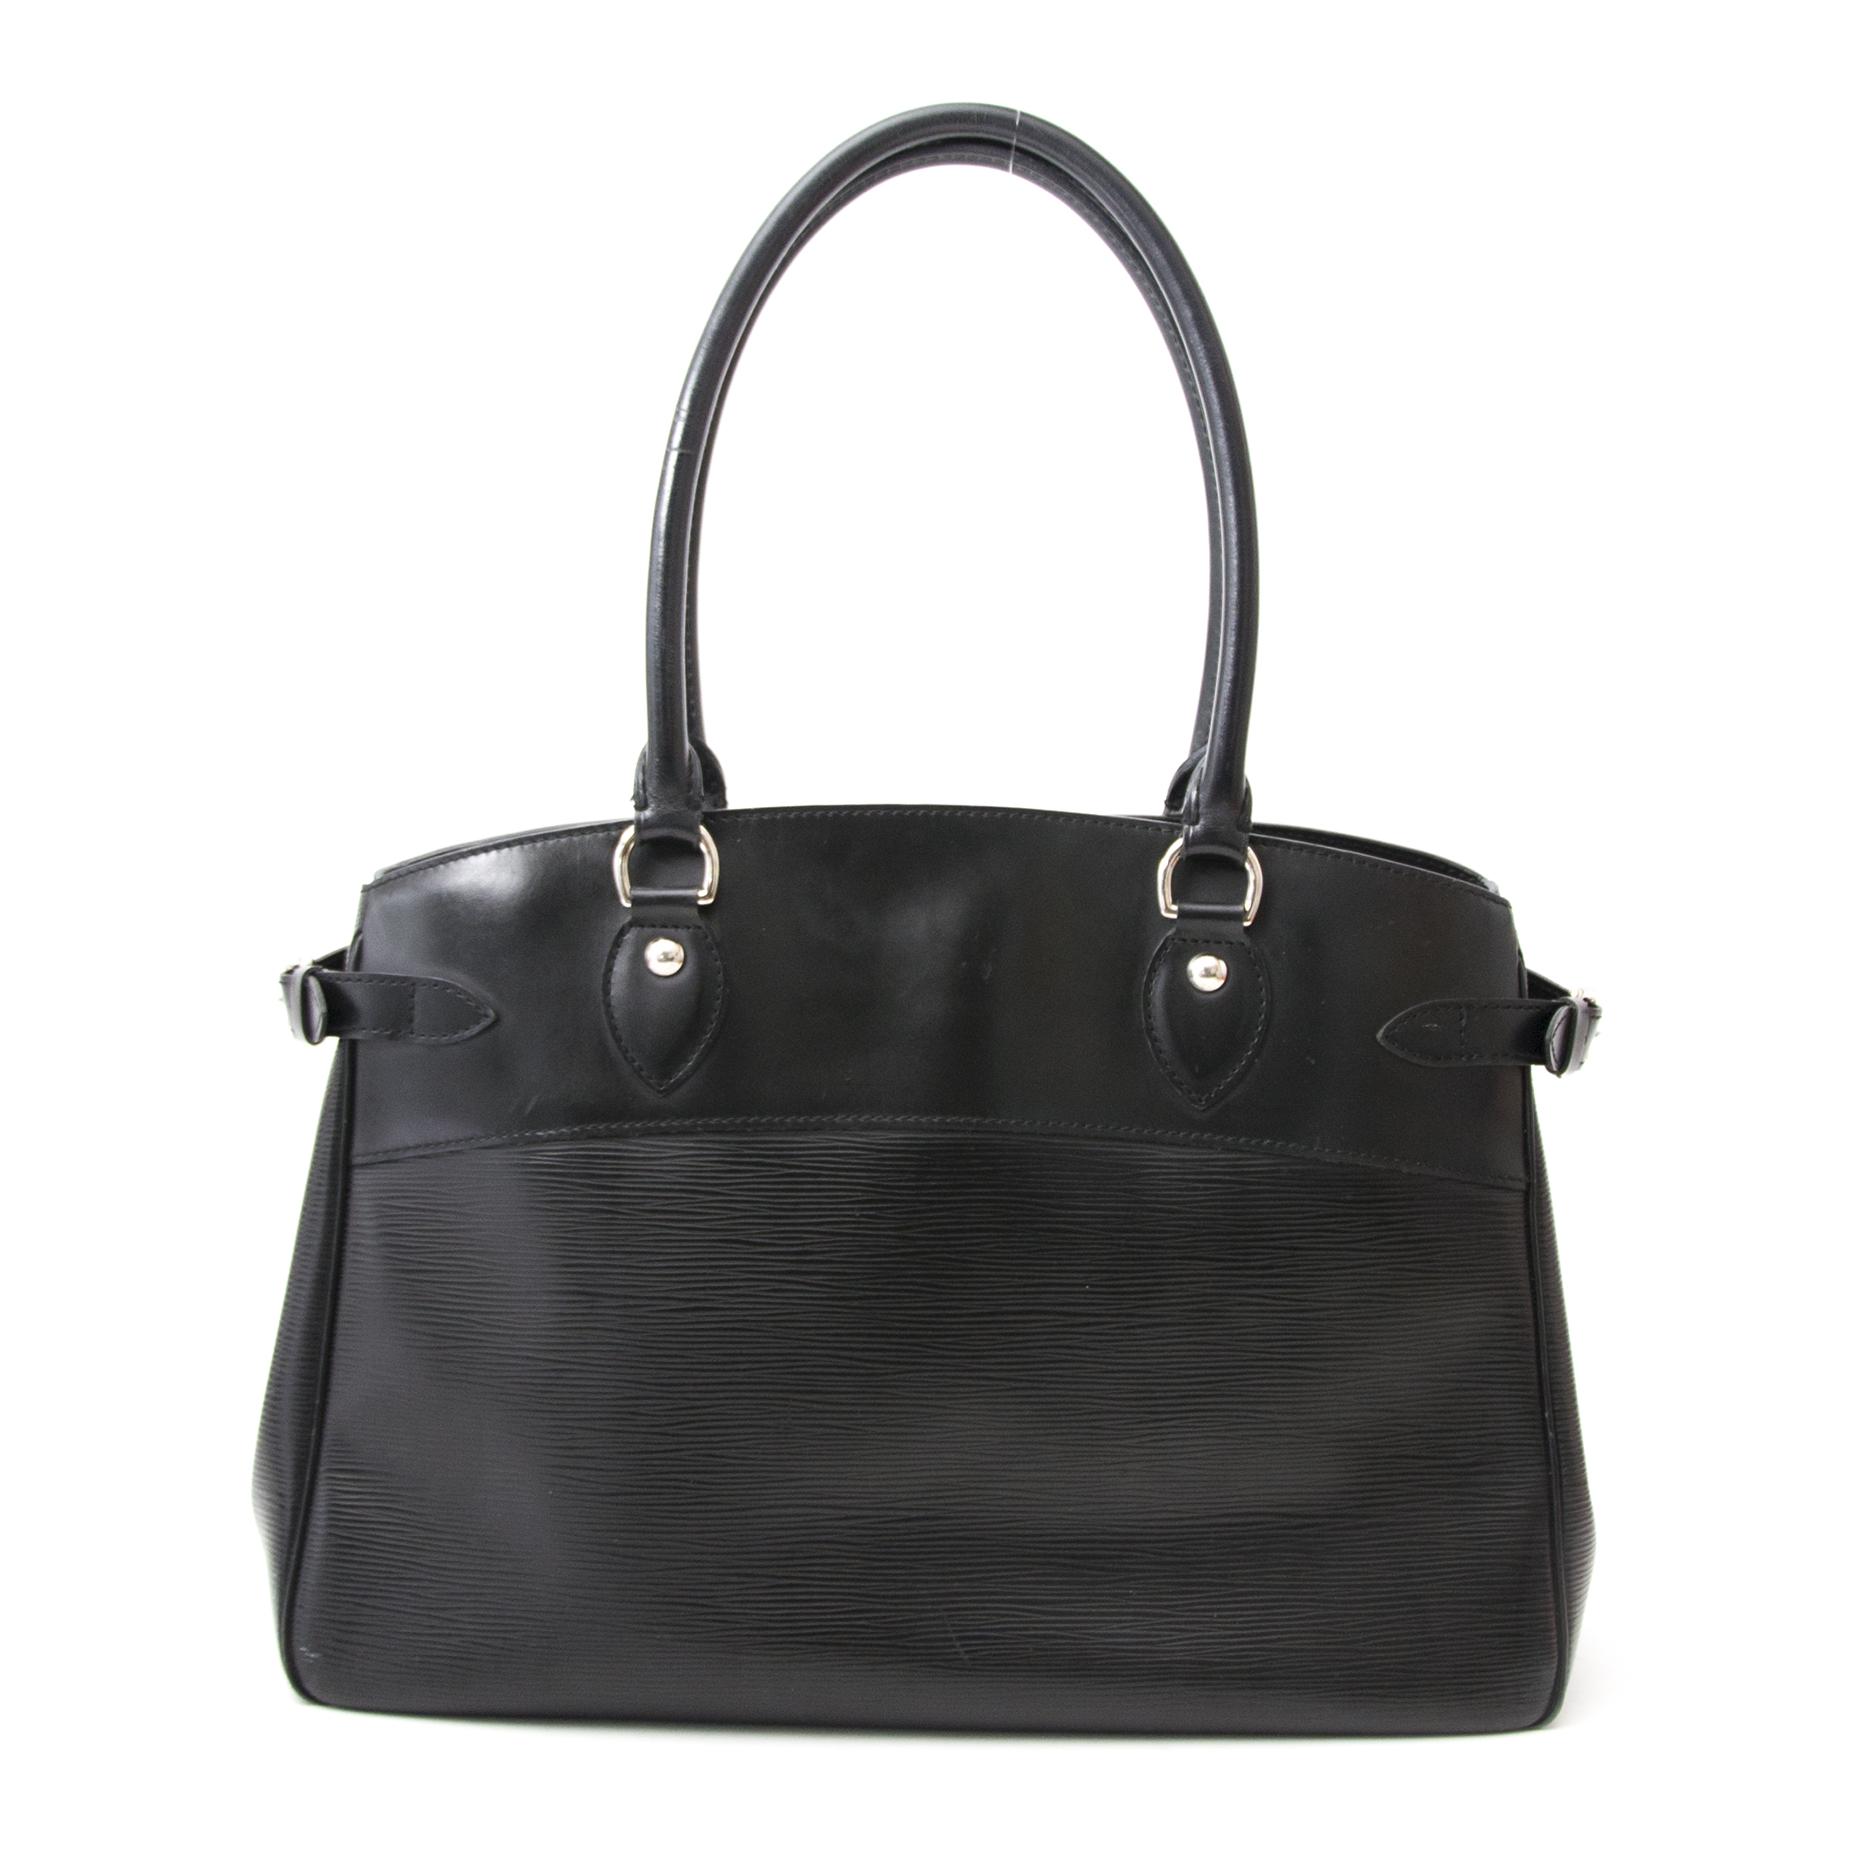 acheter en ligne comme neuf sac a main Louis Vuitton Black Epi Passy GM